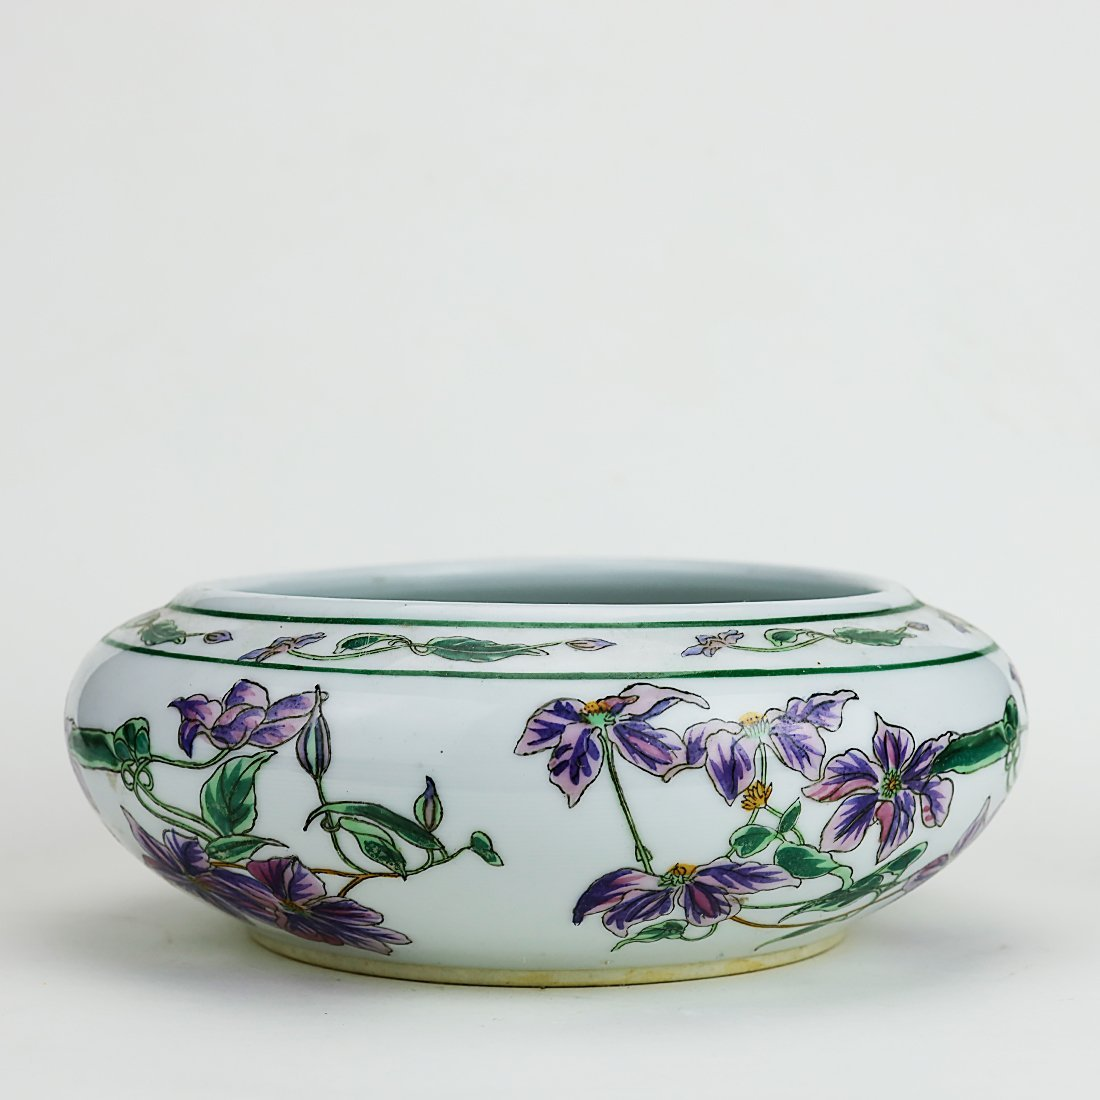 Chinese porcelain writing-brush wash, Jingdezhen - 3